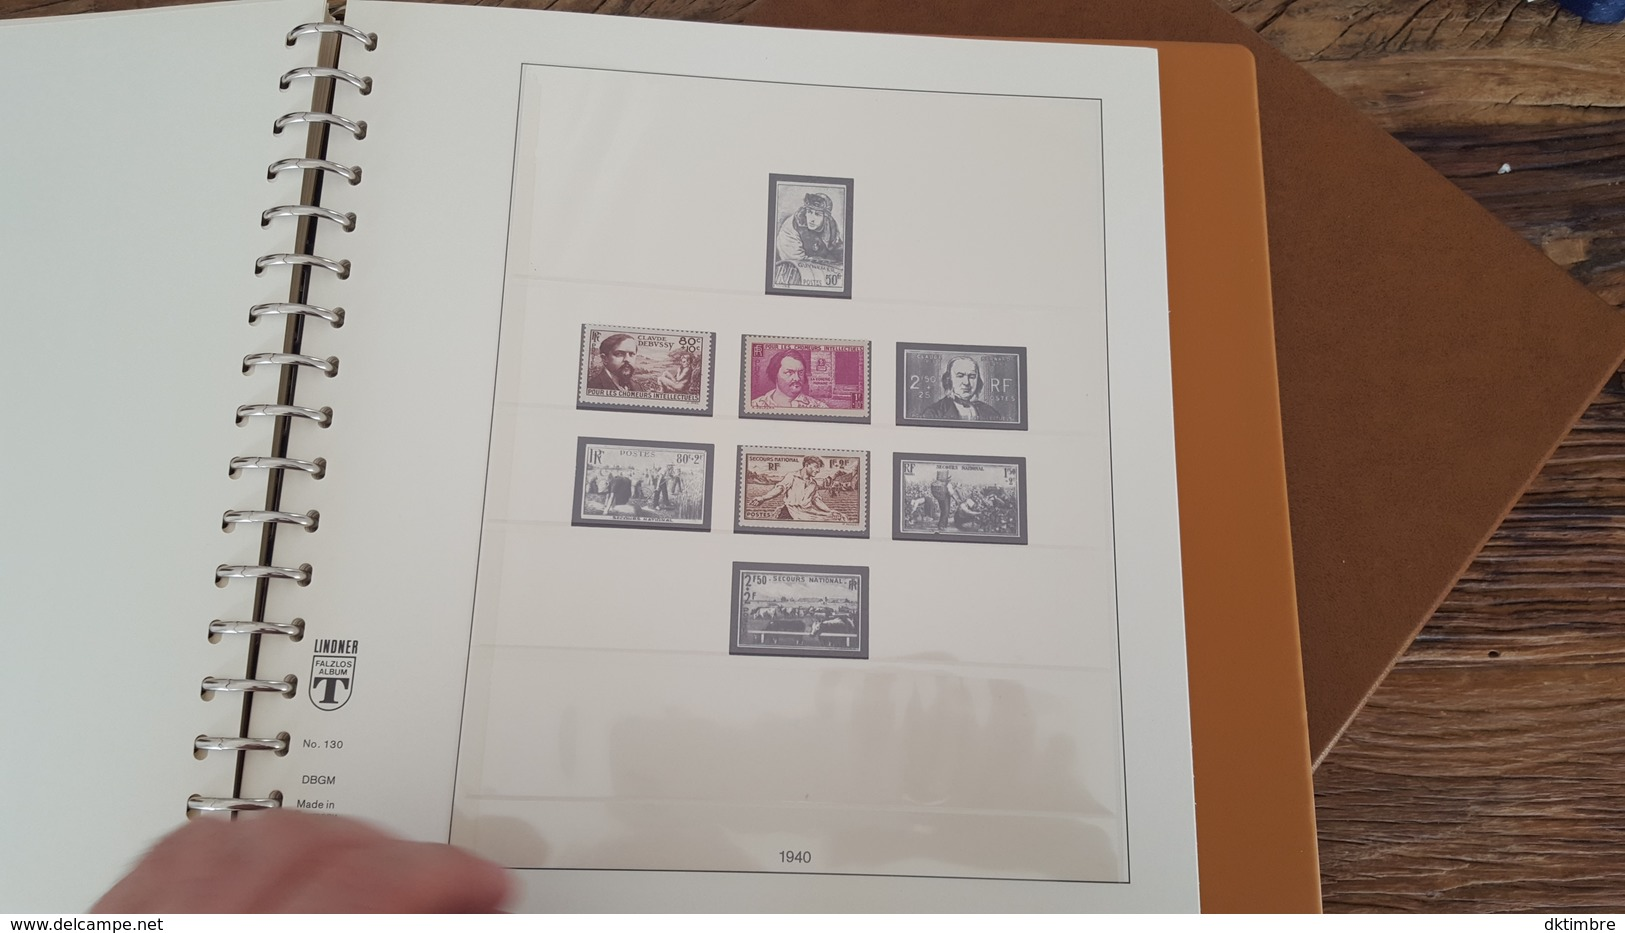 LOT 375678 ALBUM TIMBRE DE FRANCE LINDNER DE 1849 A 1940 TIMBRE NEUF* OBLITERE PORT A 10 EUROS - Collections (with Albums)